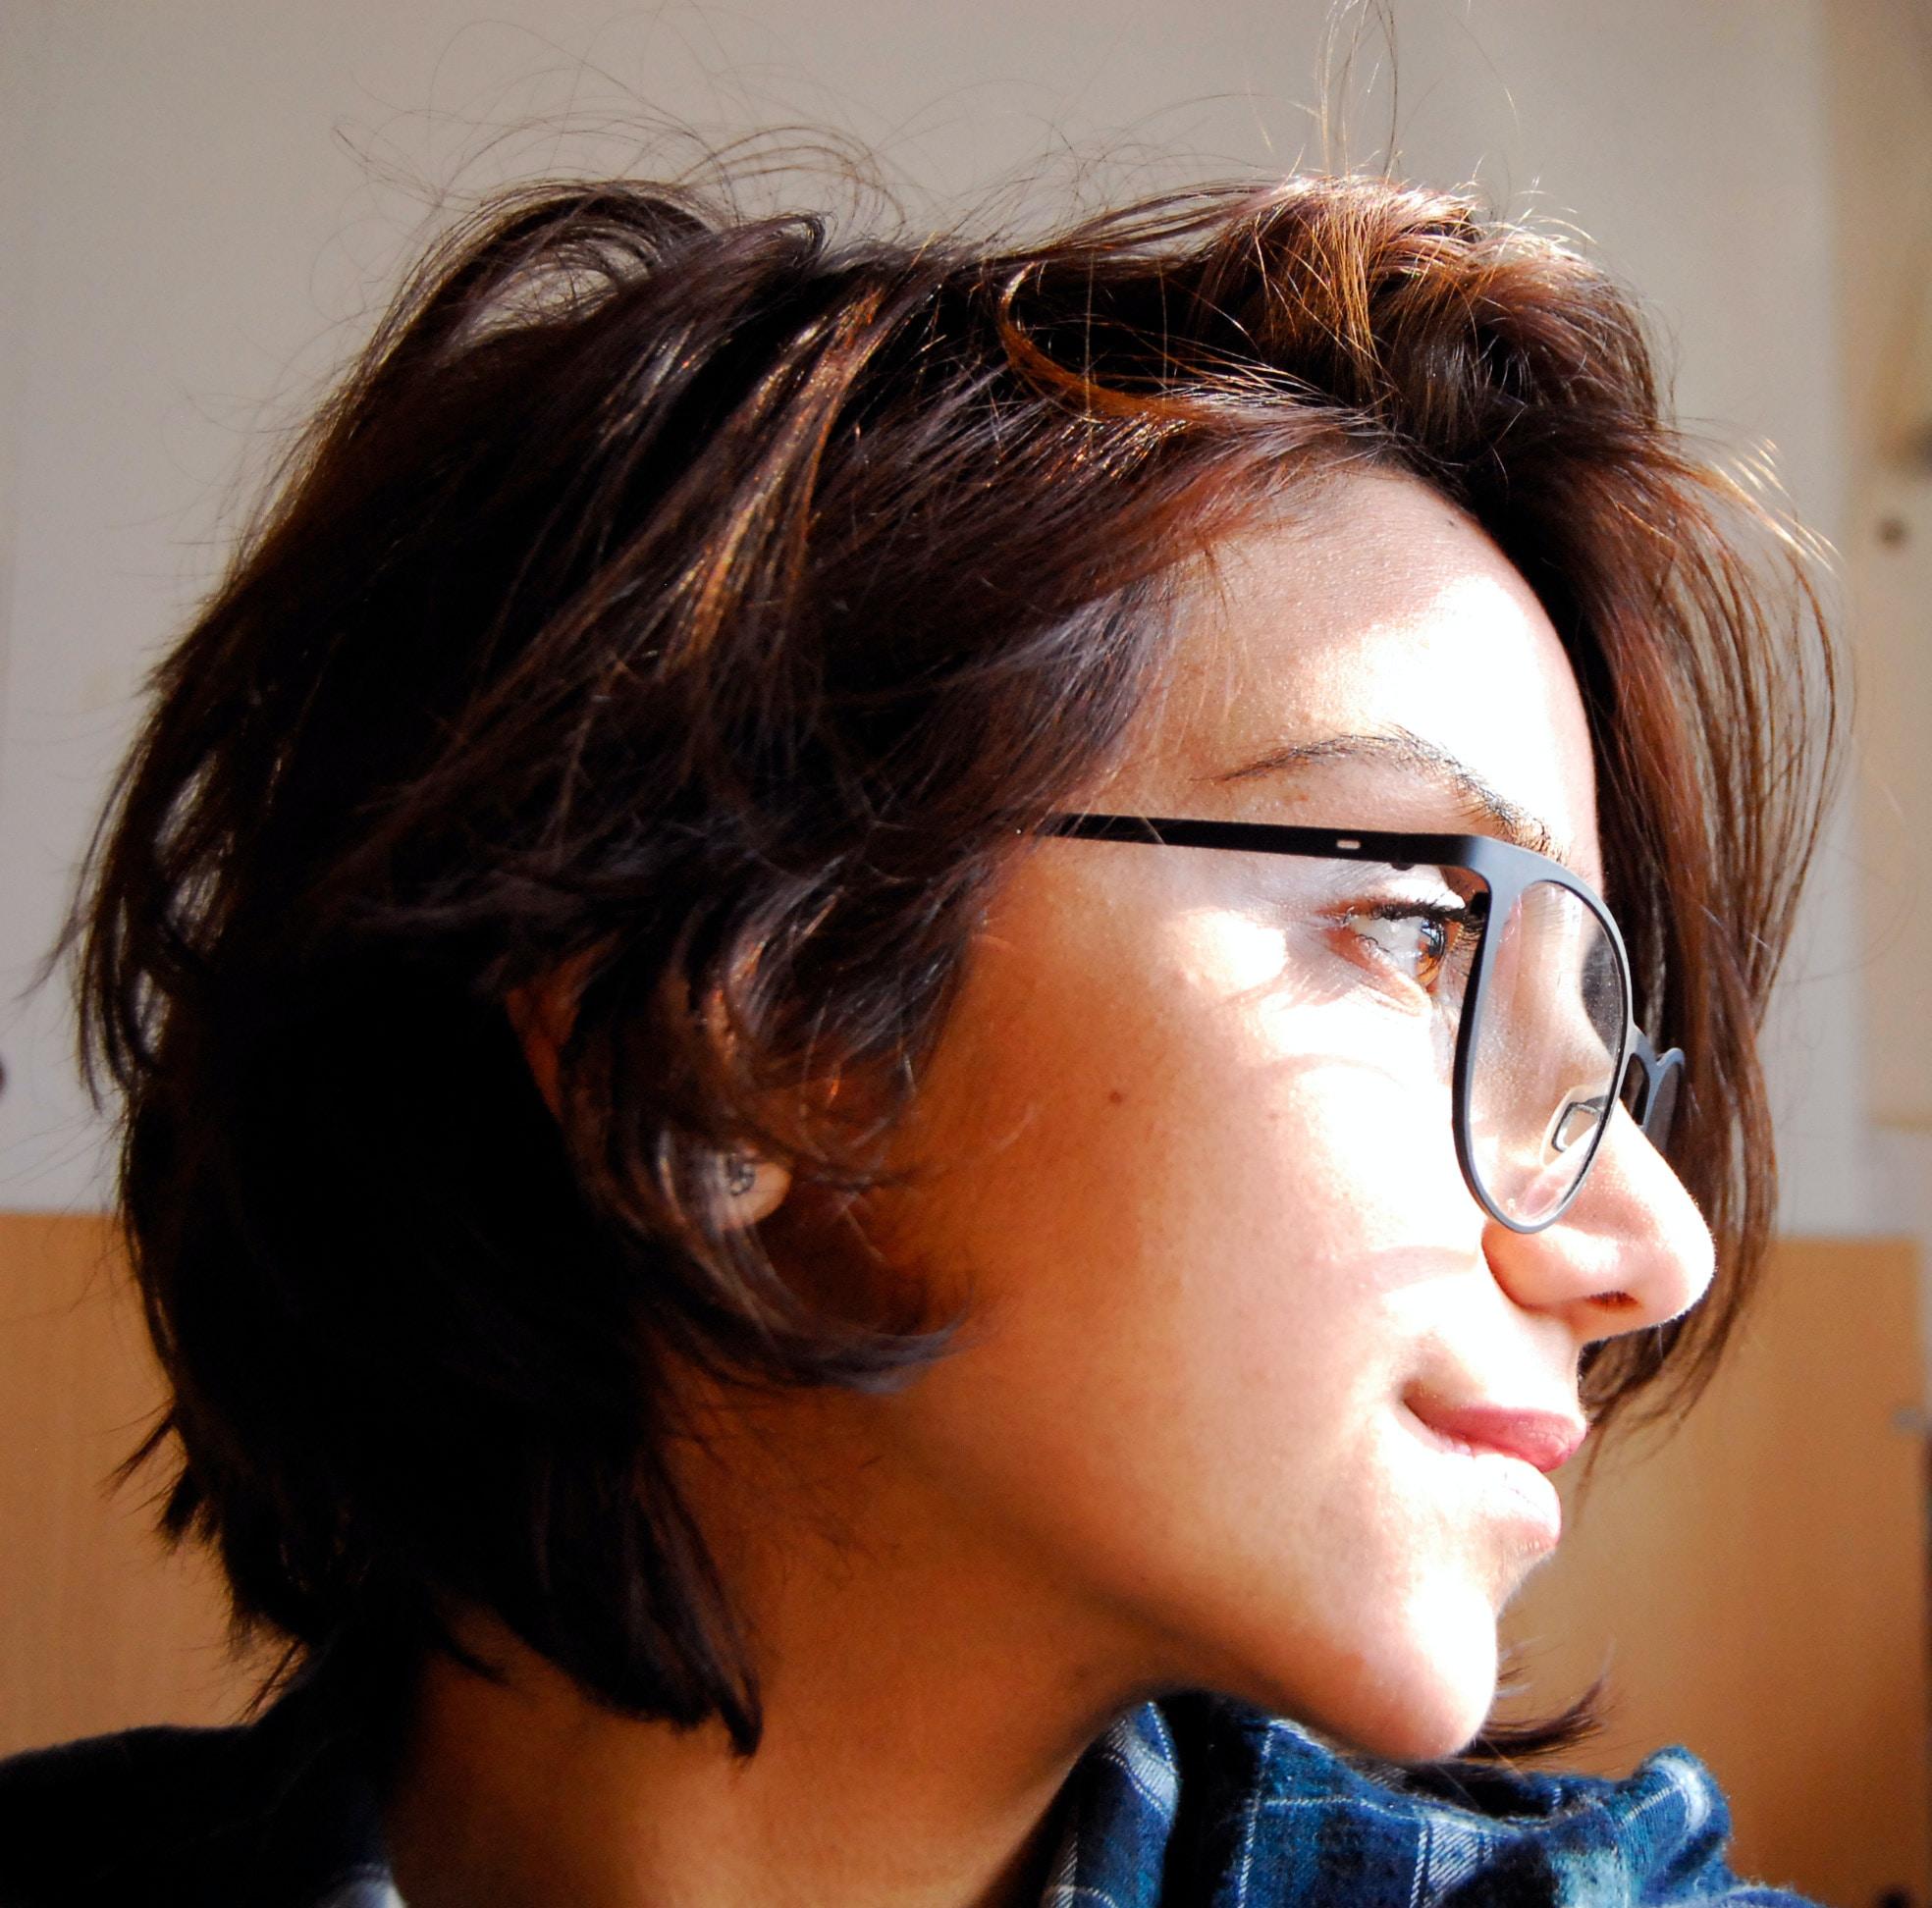 Go to Rachel Haddad's profile